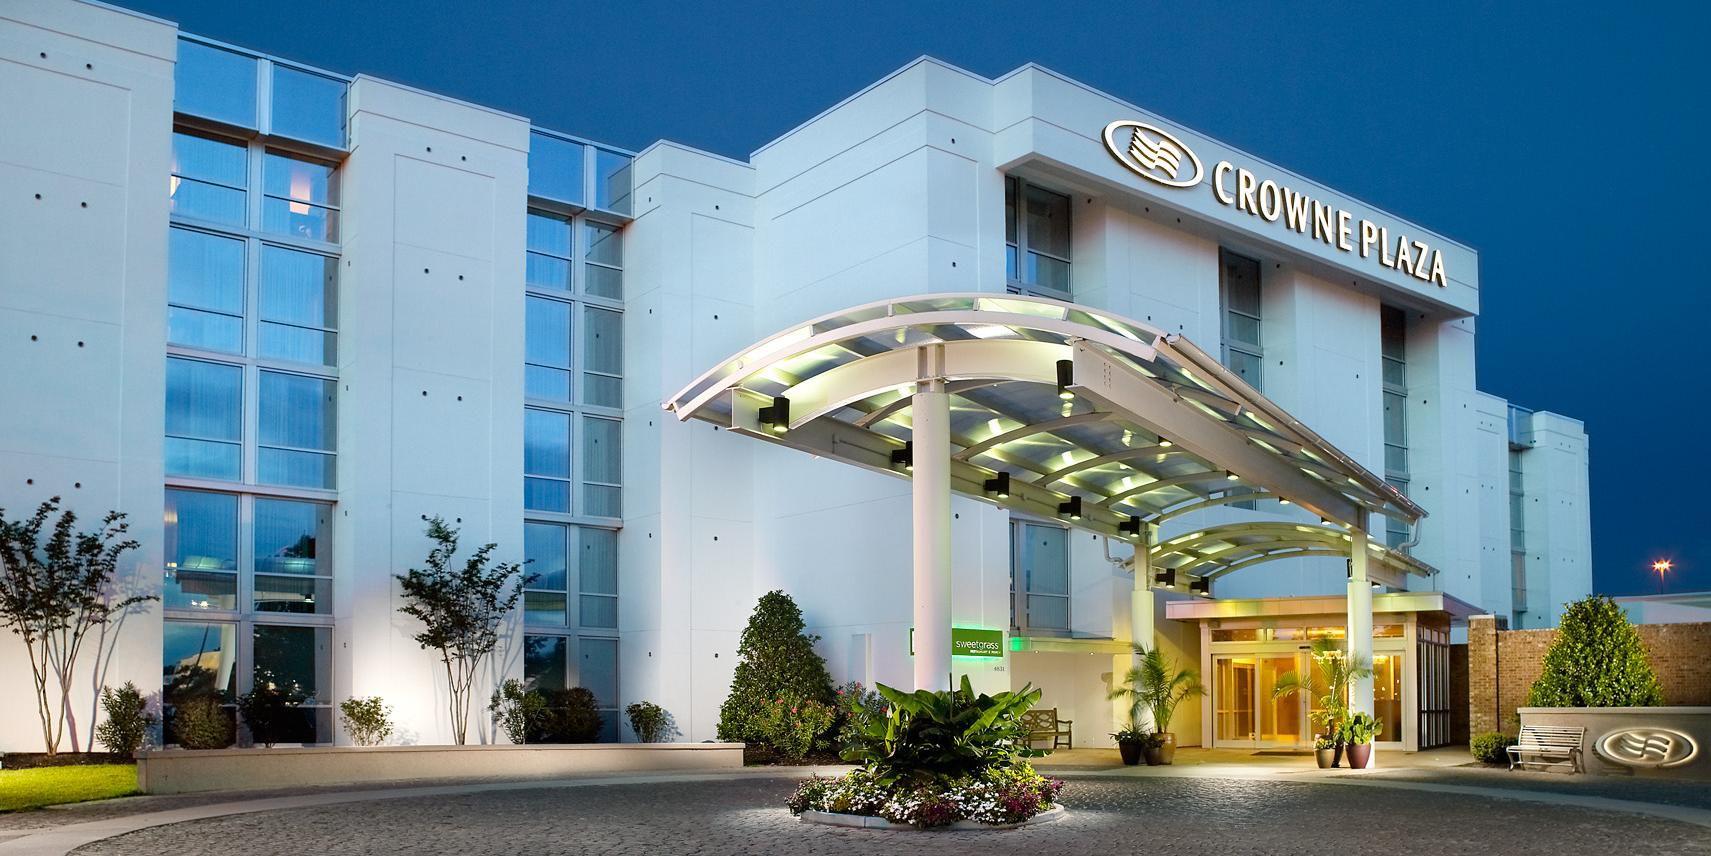 Crowne Plaza Chs Airport Hotel Near Charleston Airport